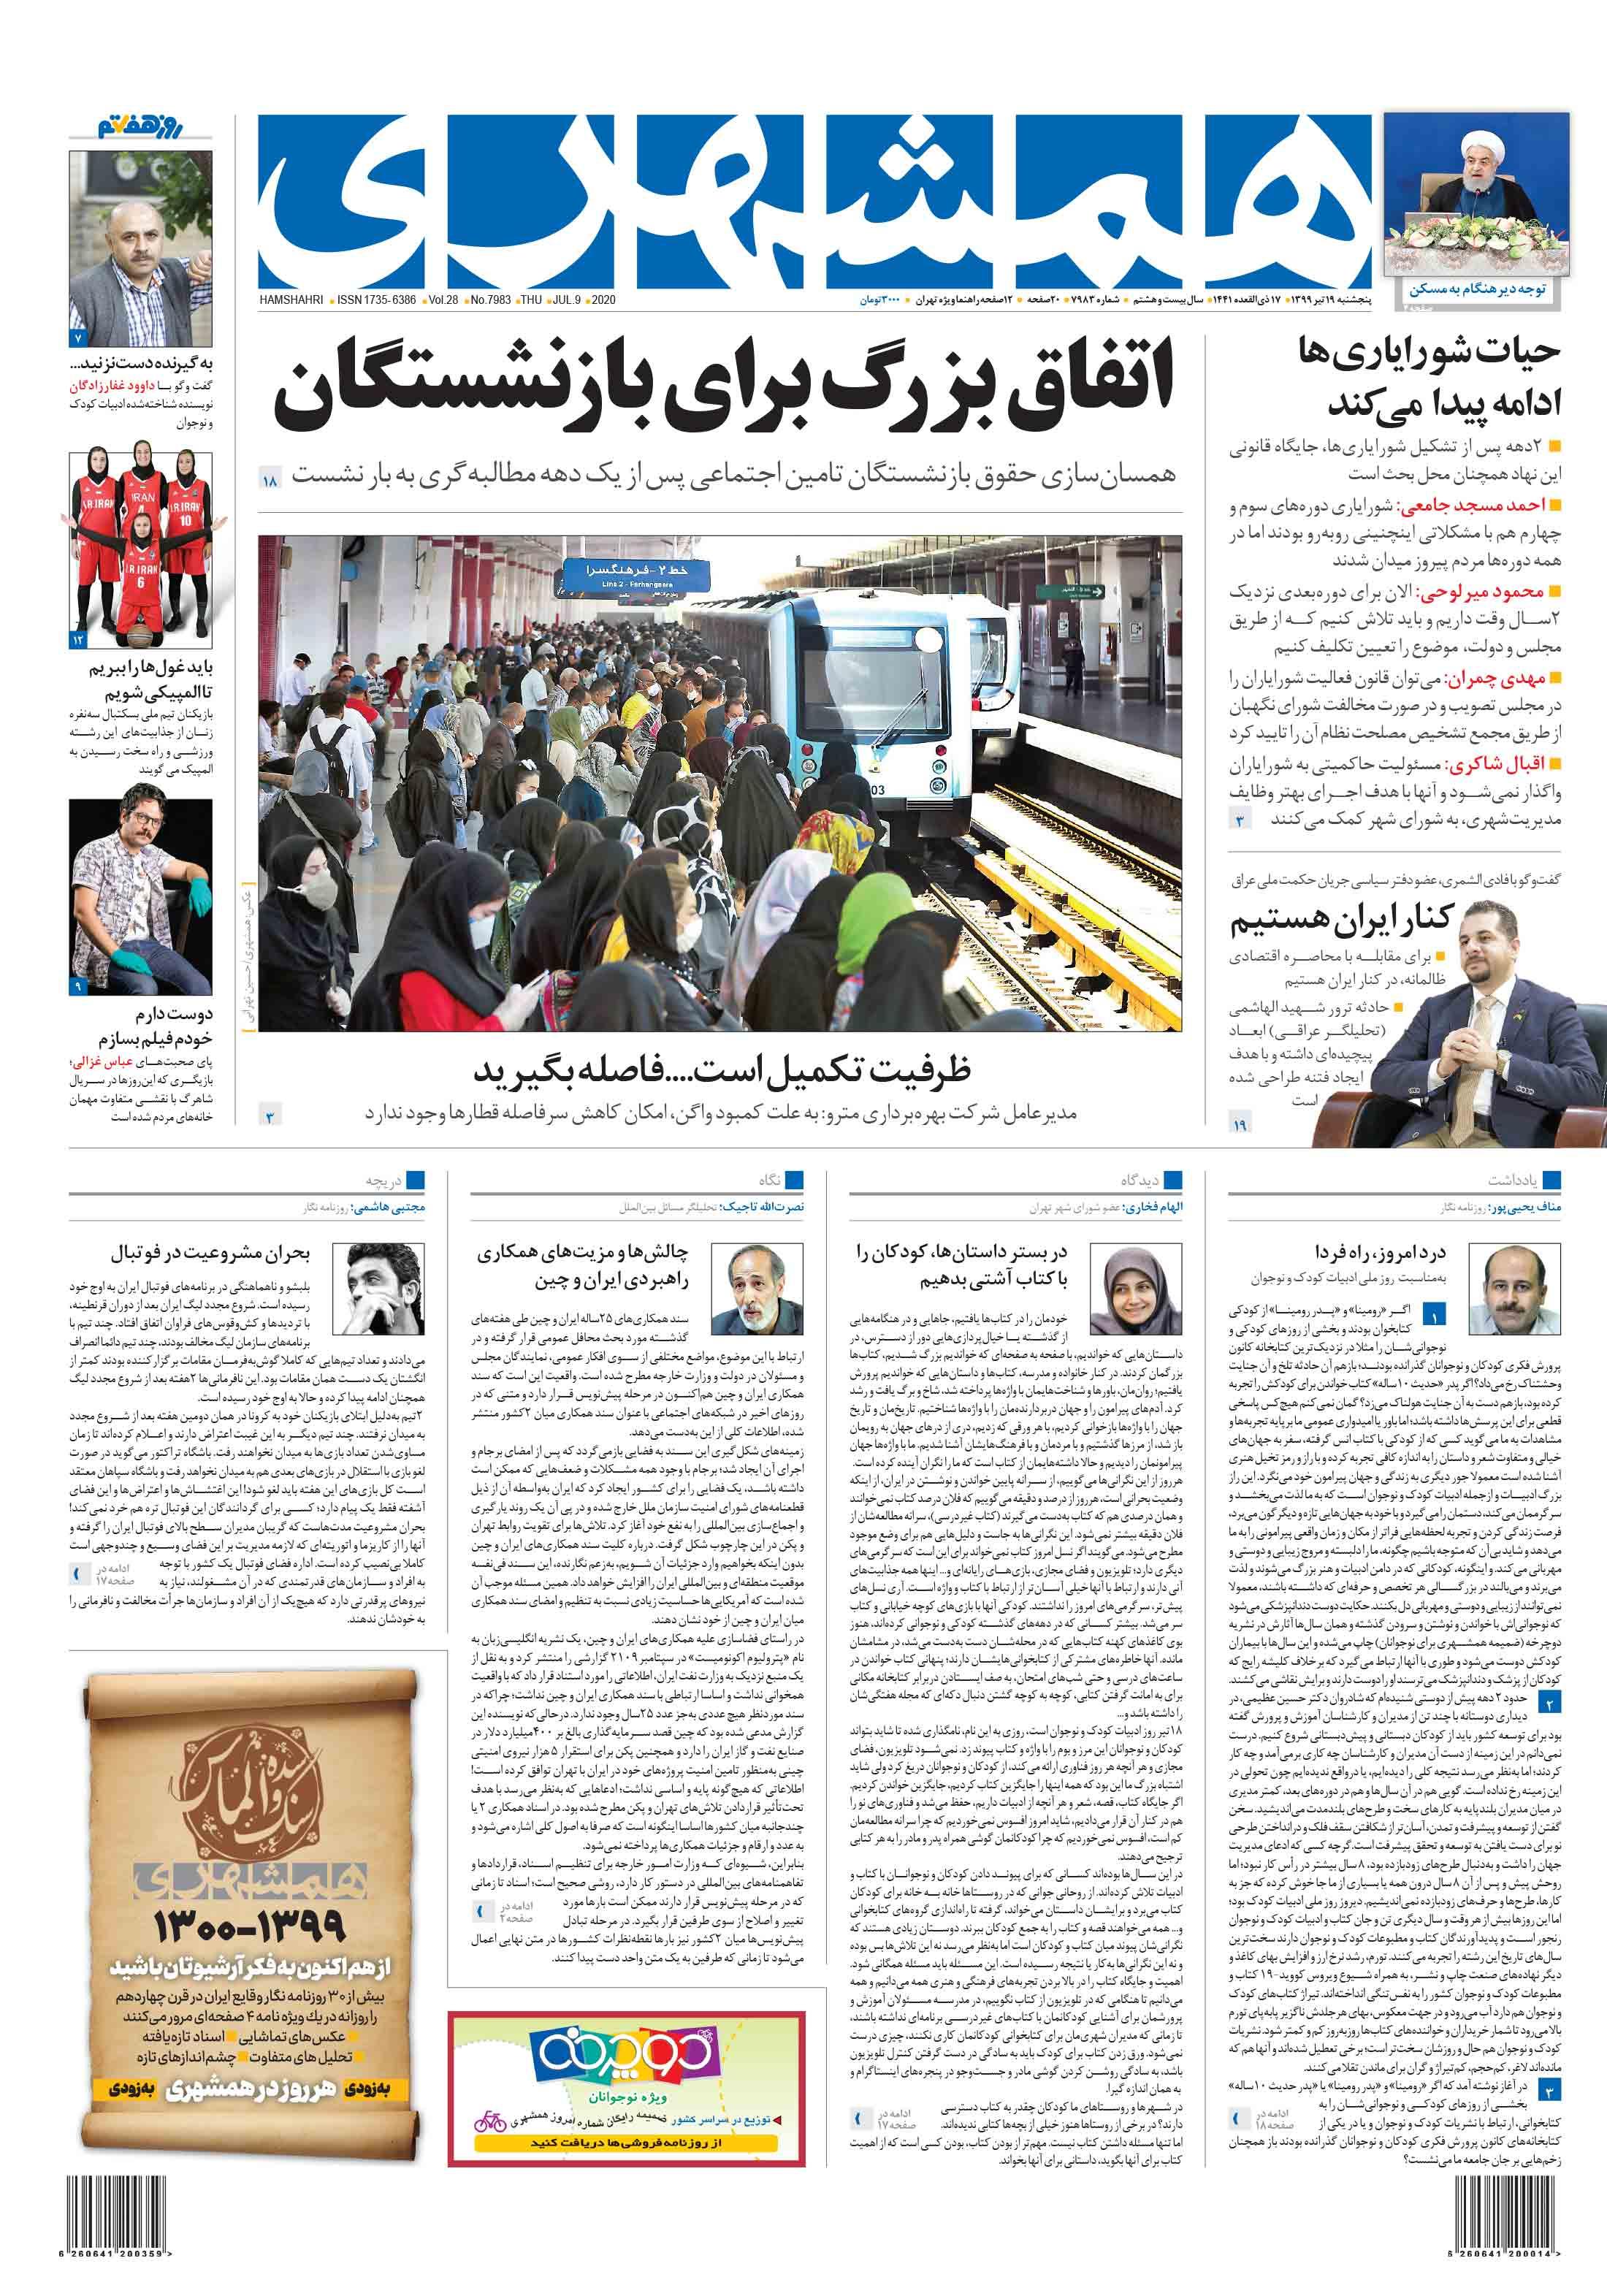 صفحه اول پنج شنبه 19 تیر 1399